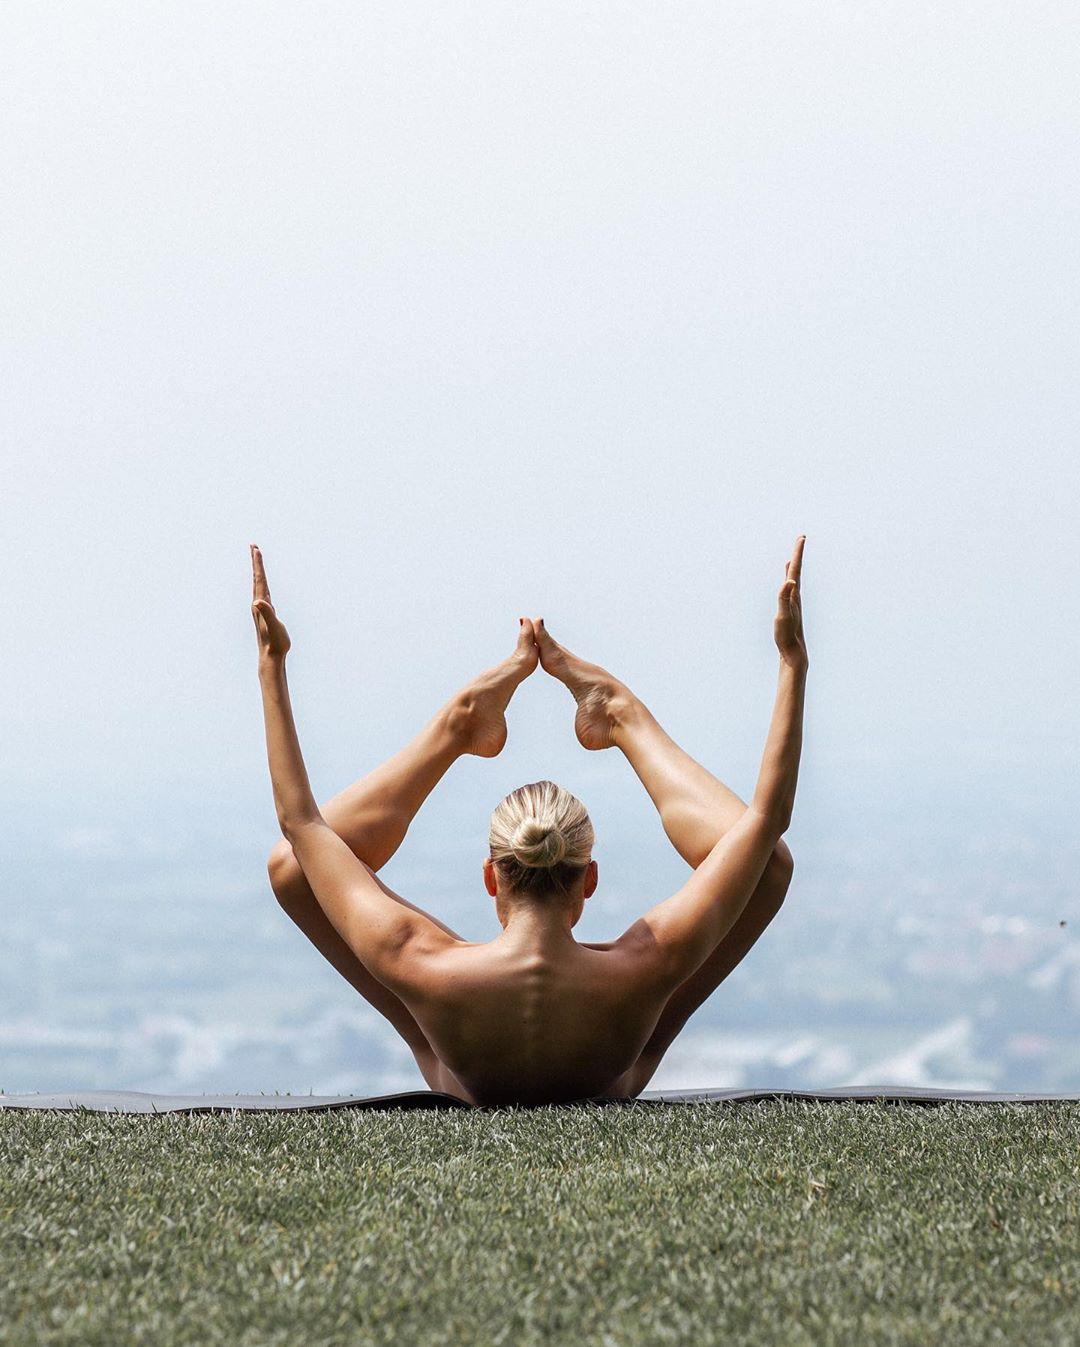 google show me nude yoga pose